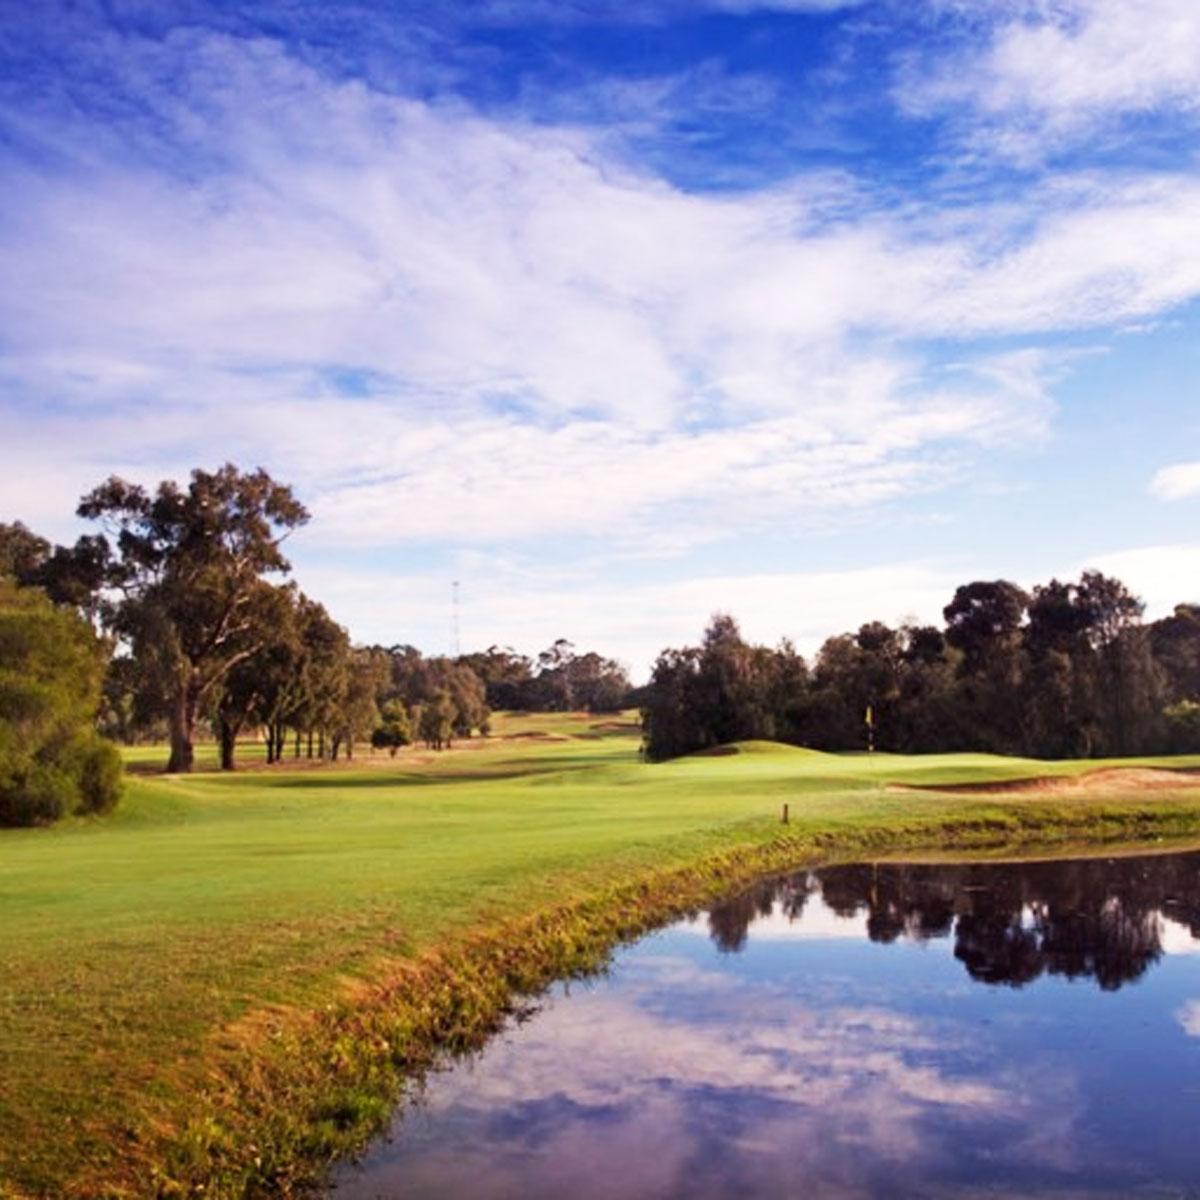 Yarrawonga Mulwala Golf Resort Lake Course